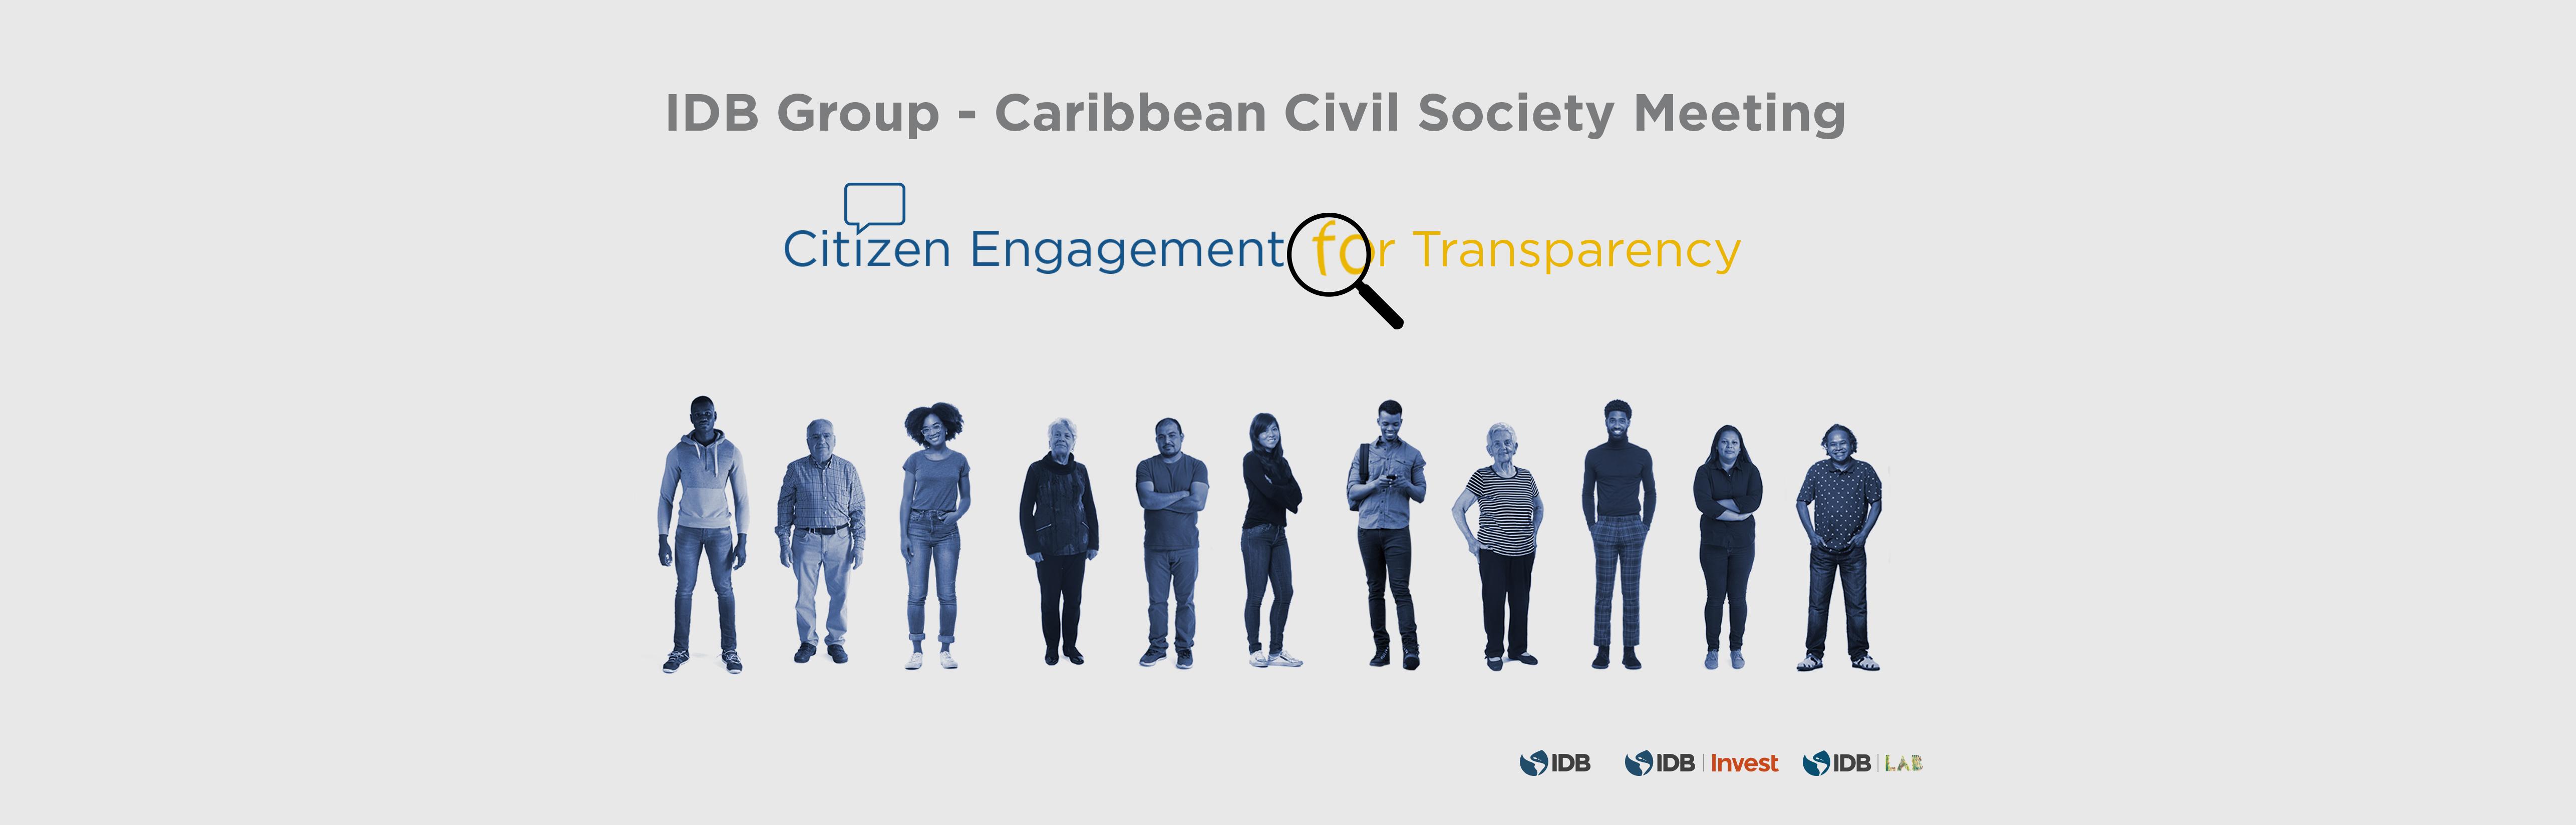 Banner foro caribe 2019 sociedad civil BID